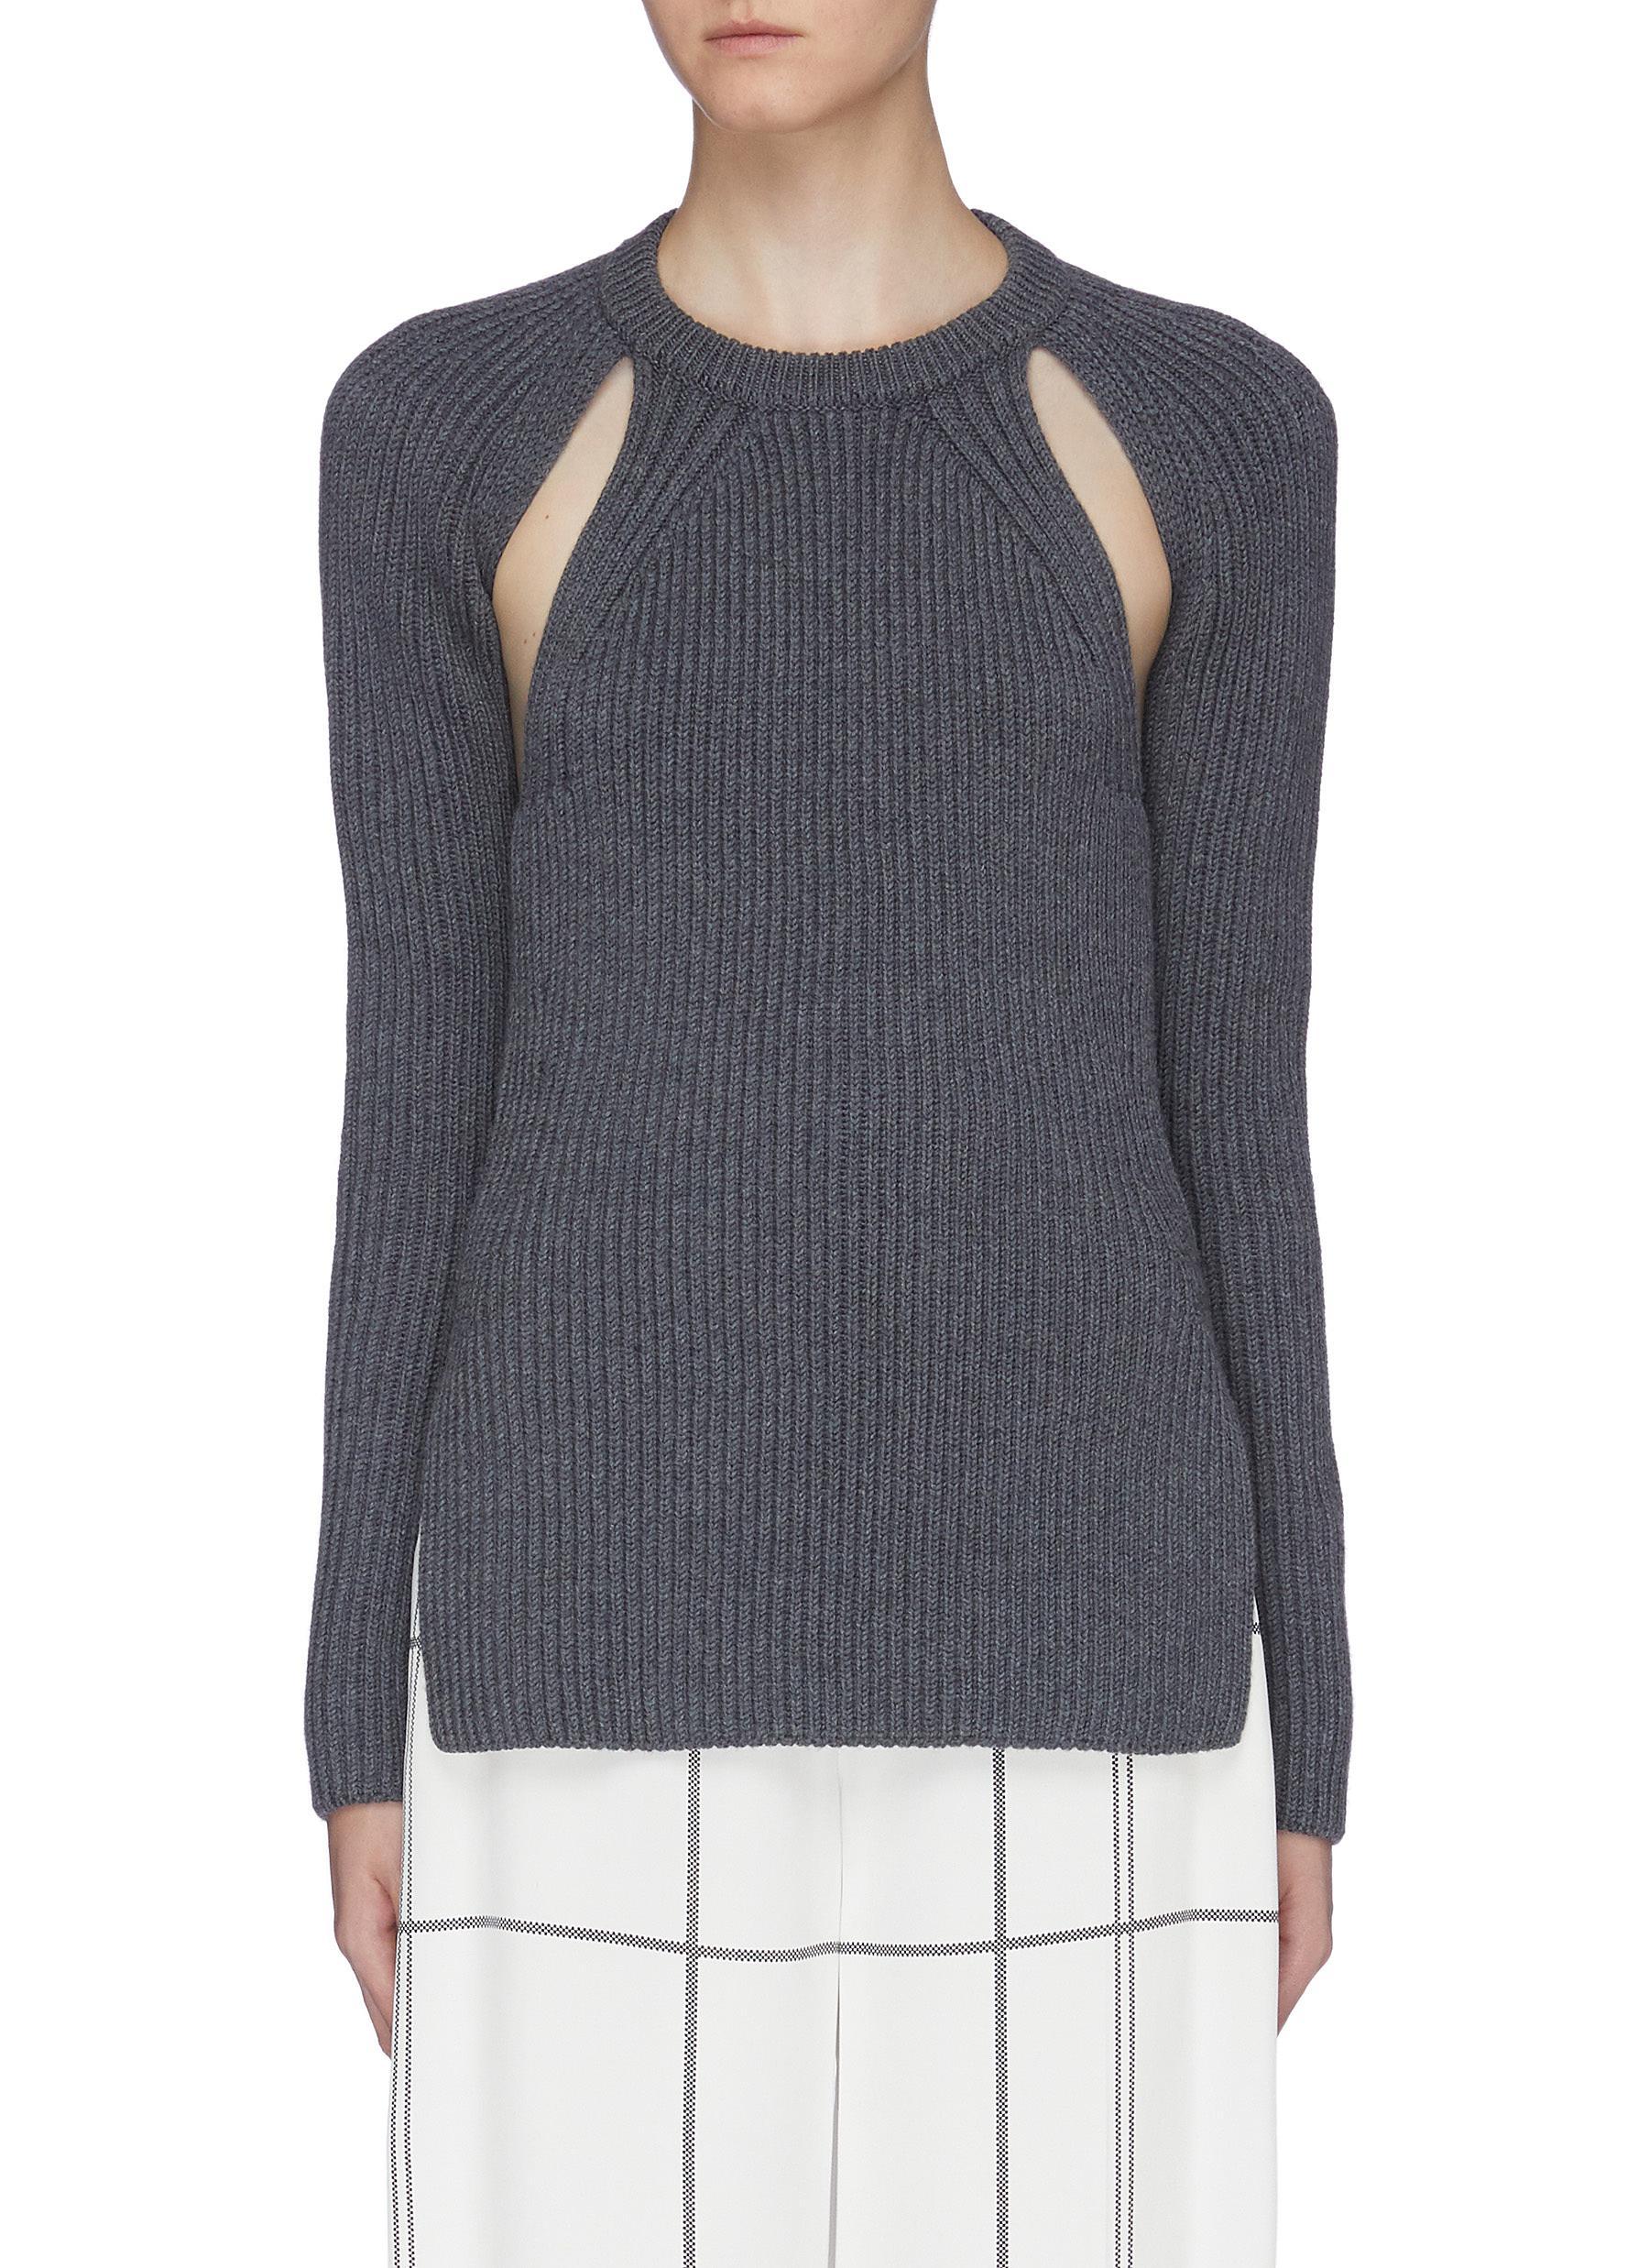 Open back cutout virgin wool rib knit sweater by Proenza Schouler